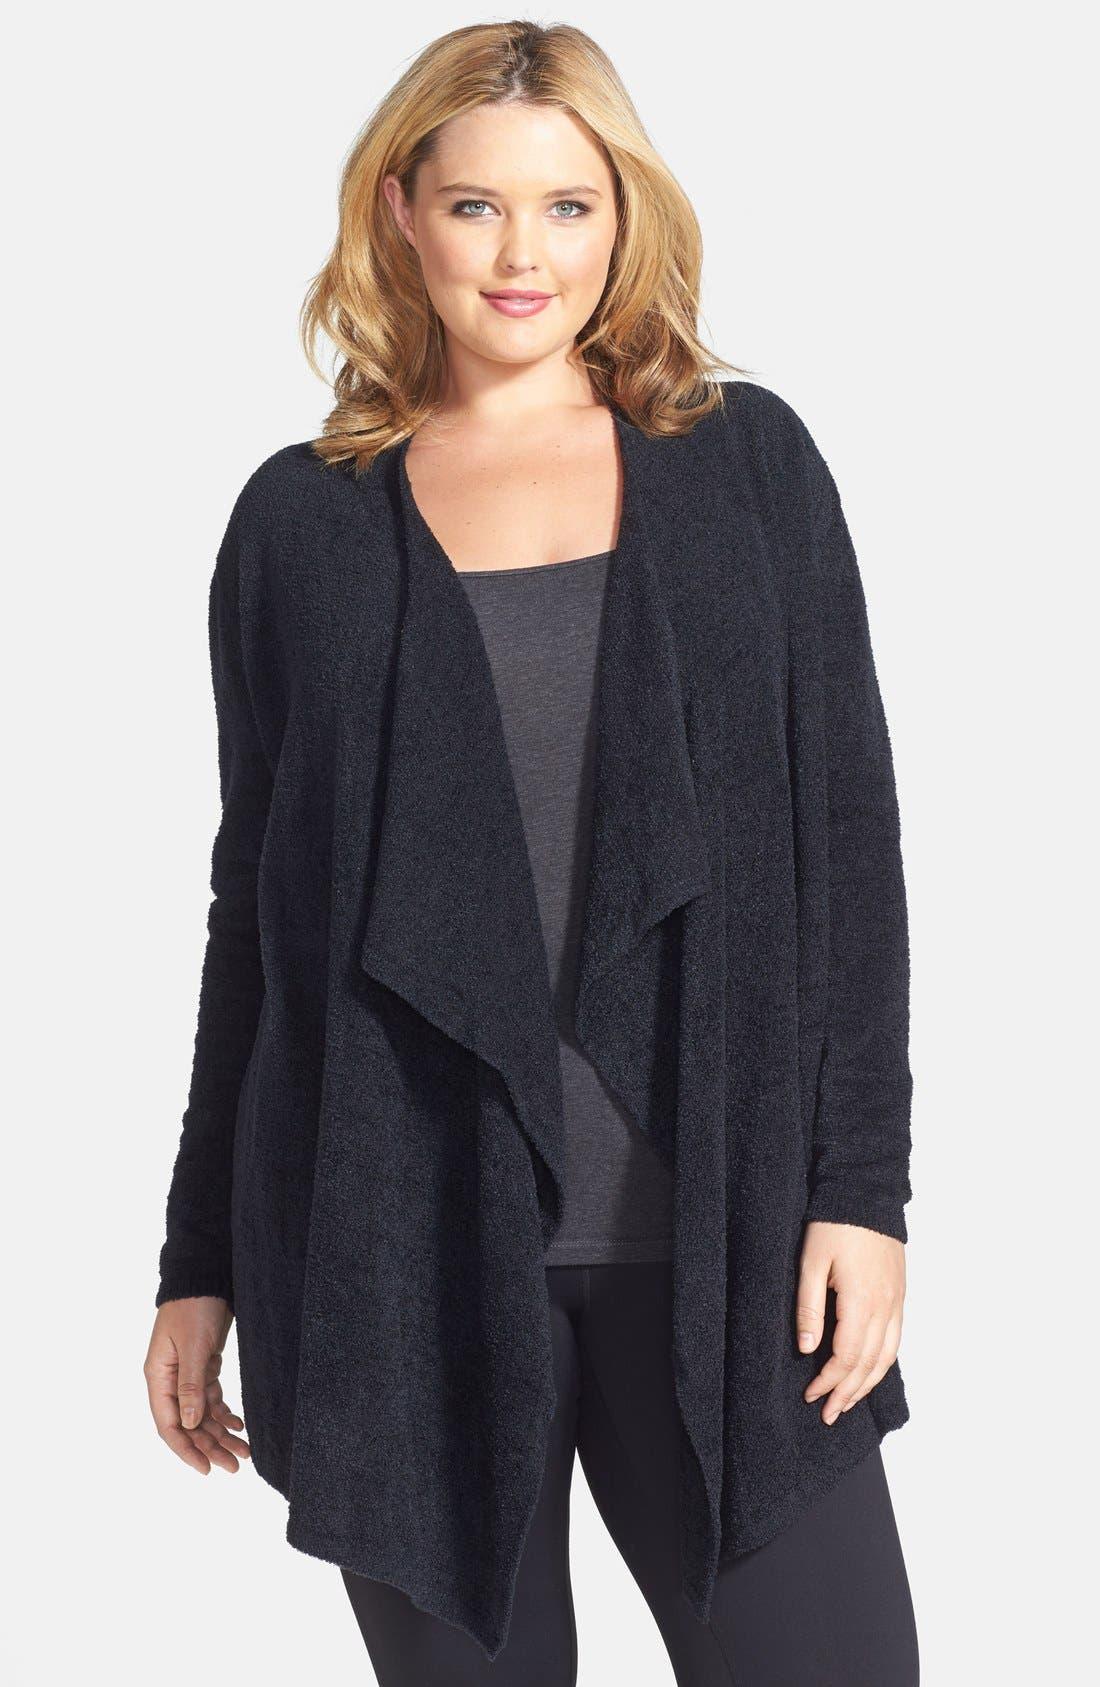 CozyChic Lite<sup>®</sup> Calypso Wrap Cardigan,                             Main thumbnail 1, color,                             BLACK